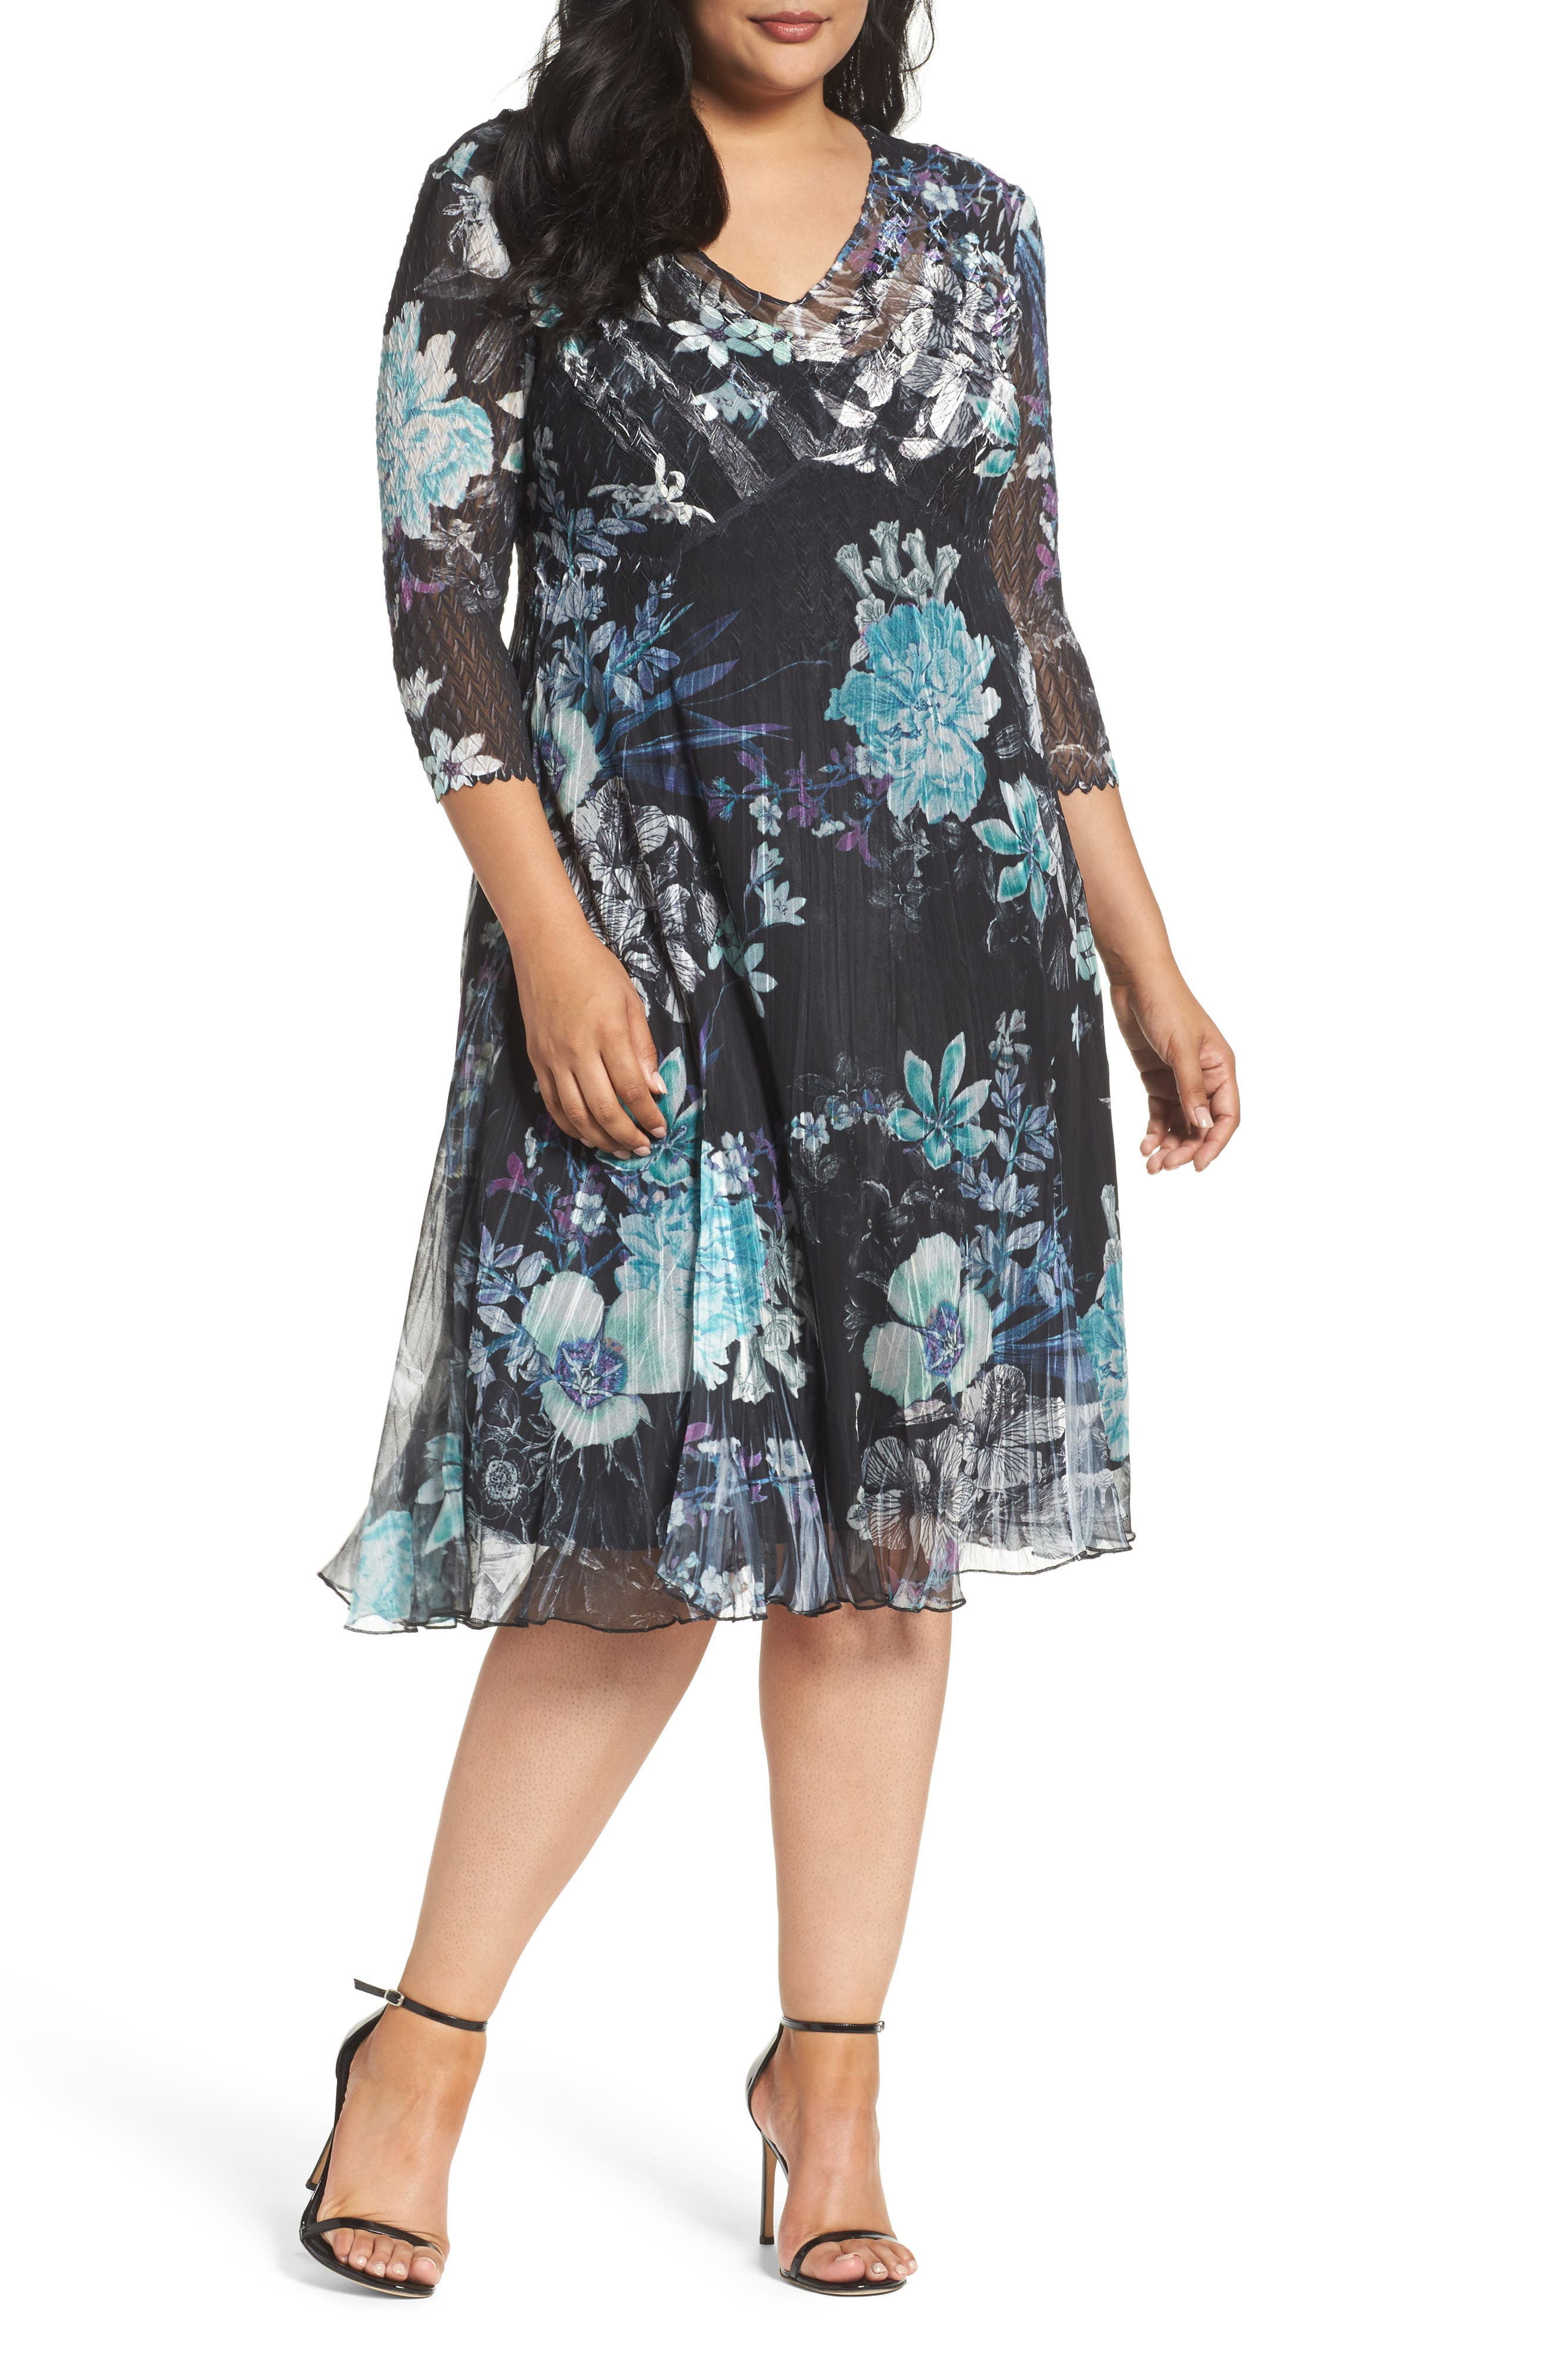 Alternate Image 1 Selected - Komarov Print Chiffon Dress (Plus Size)